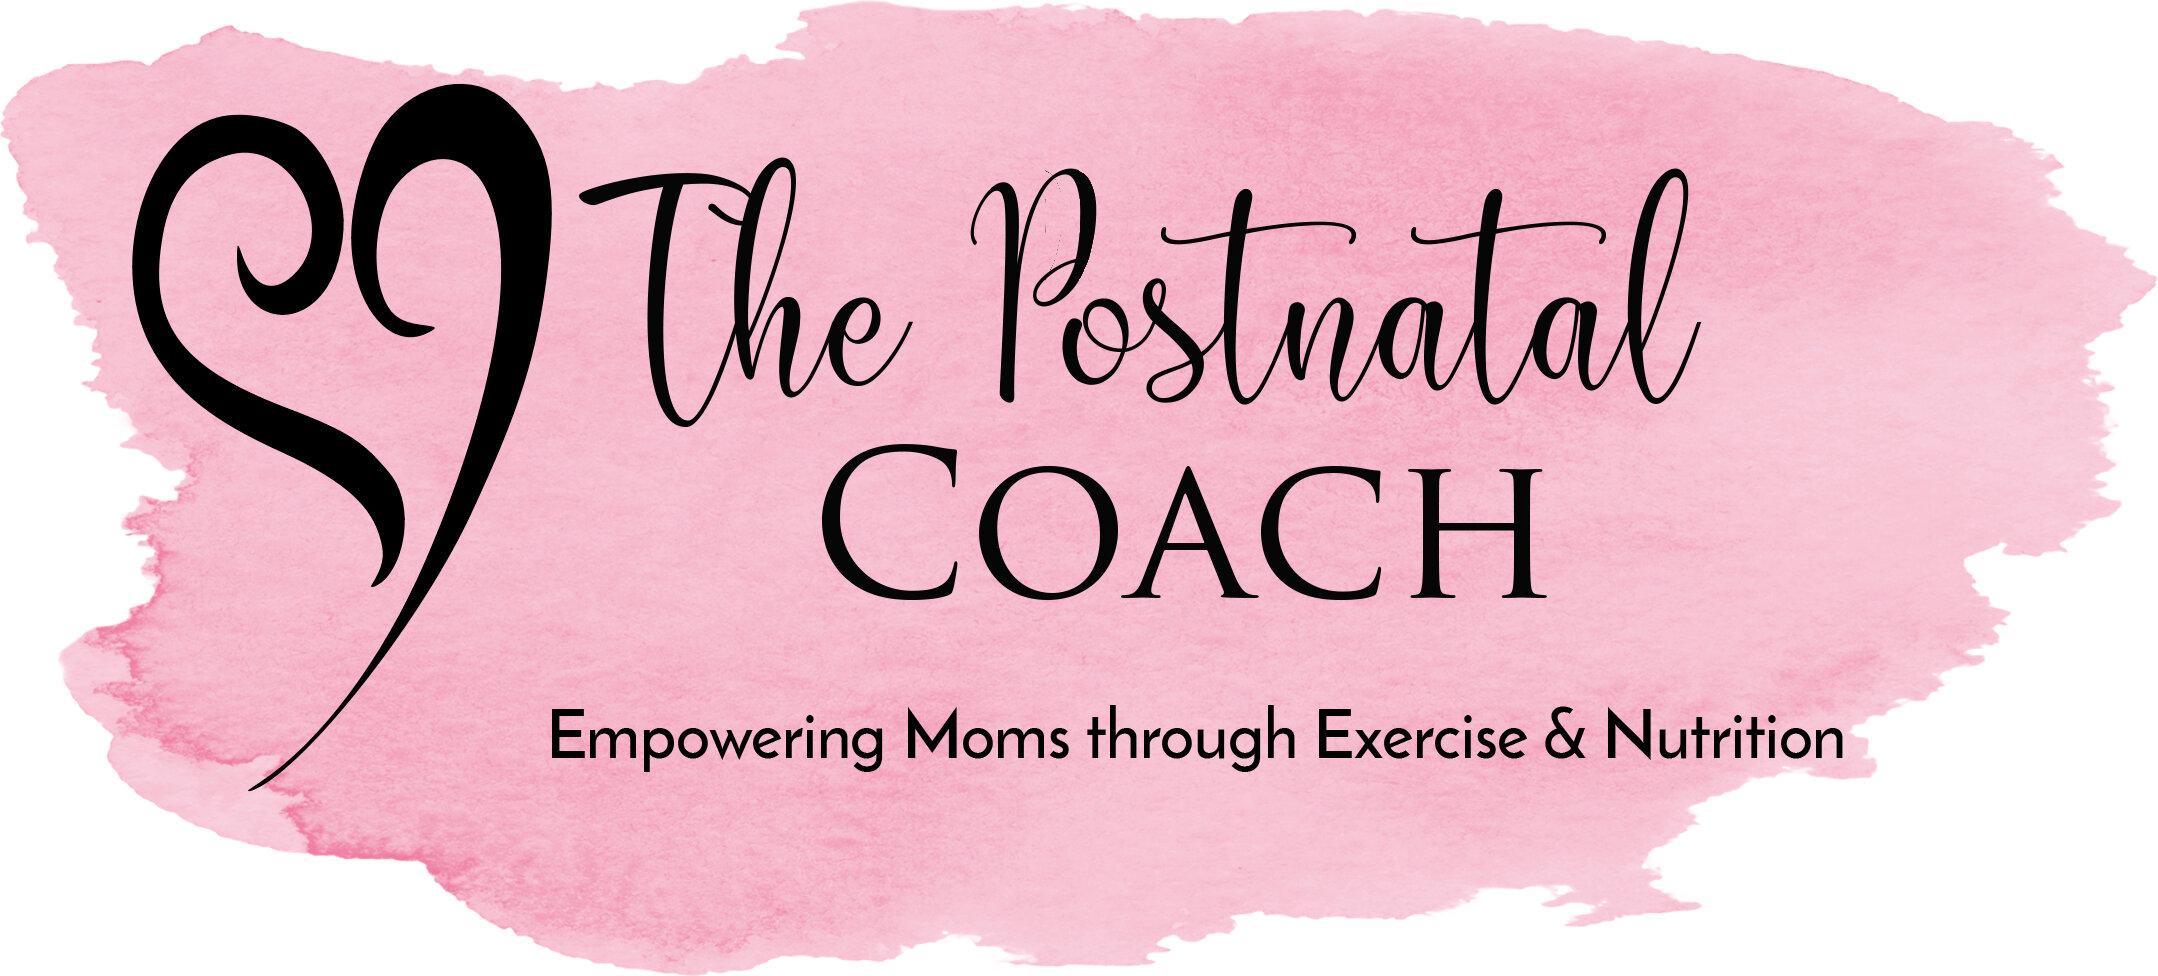 The_Postnatal_Coach-Black.jpg